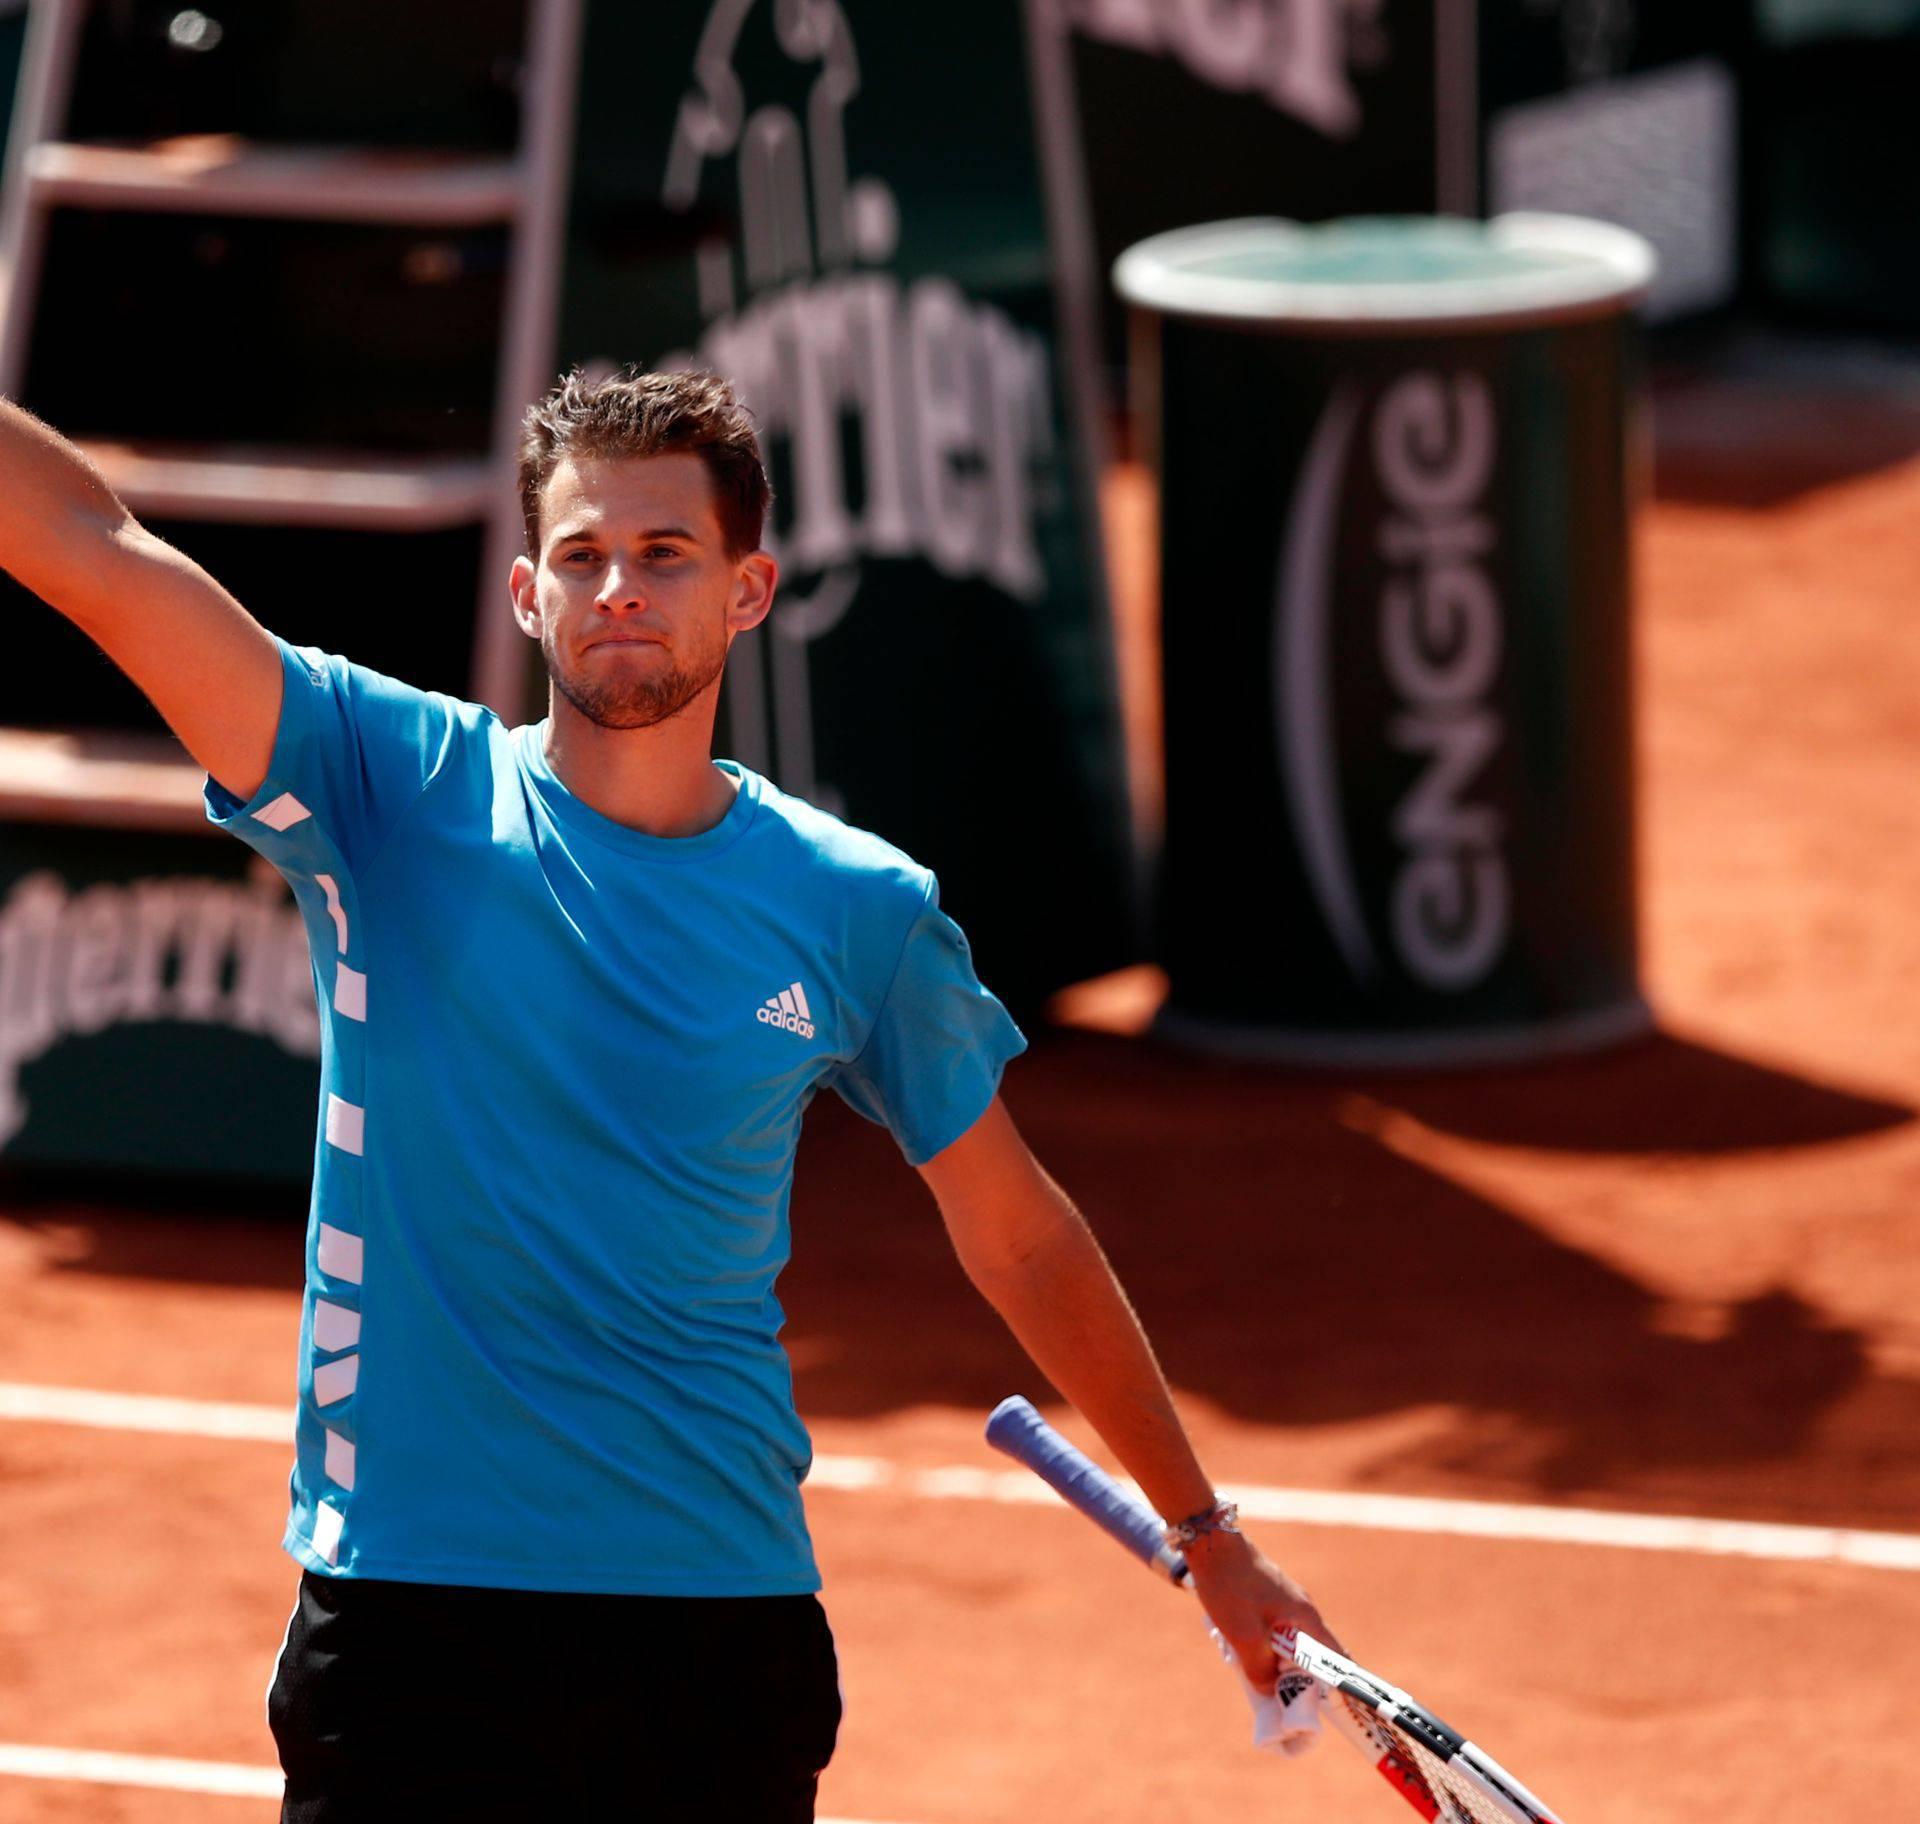 Thiem nakon velike borbe bolji od Đokovića, finale s Nadalom